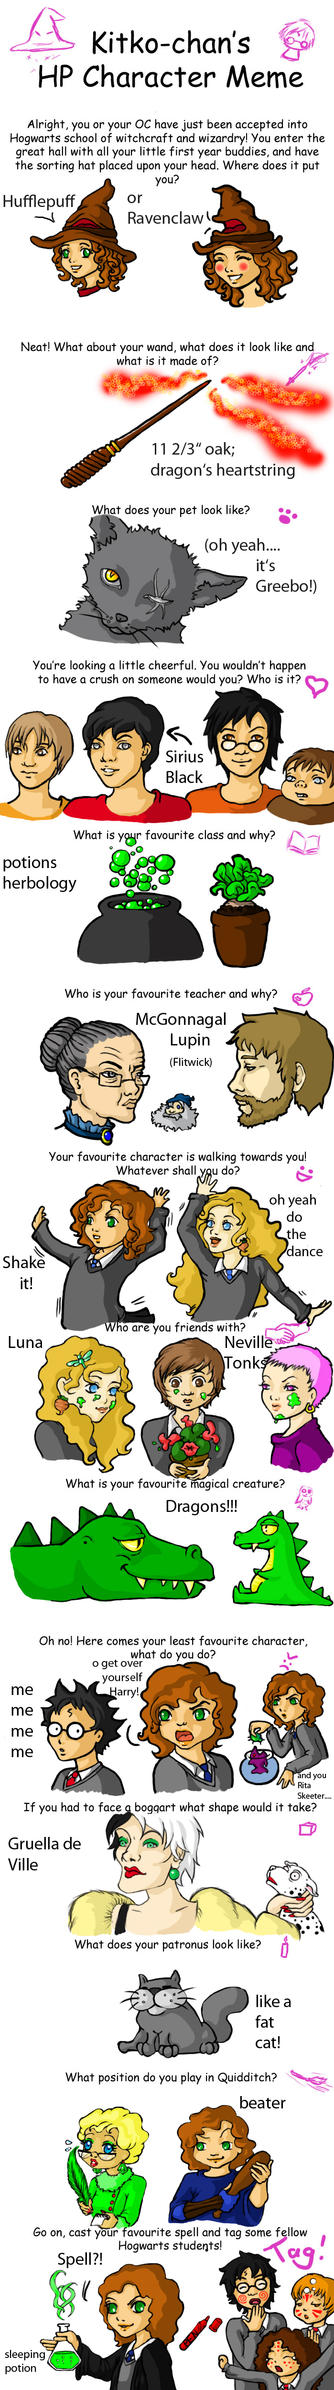 Harry Potter Character Meme by bekkiki